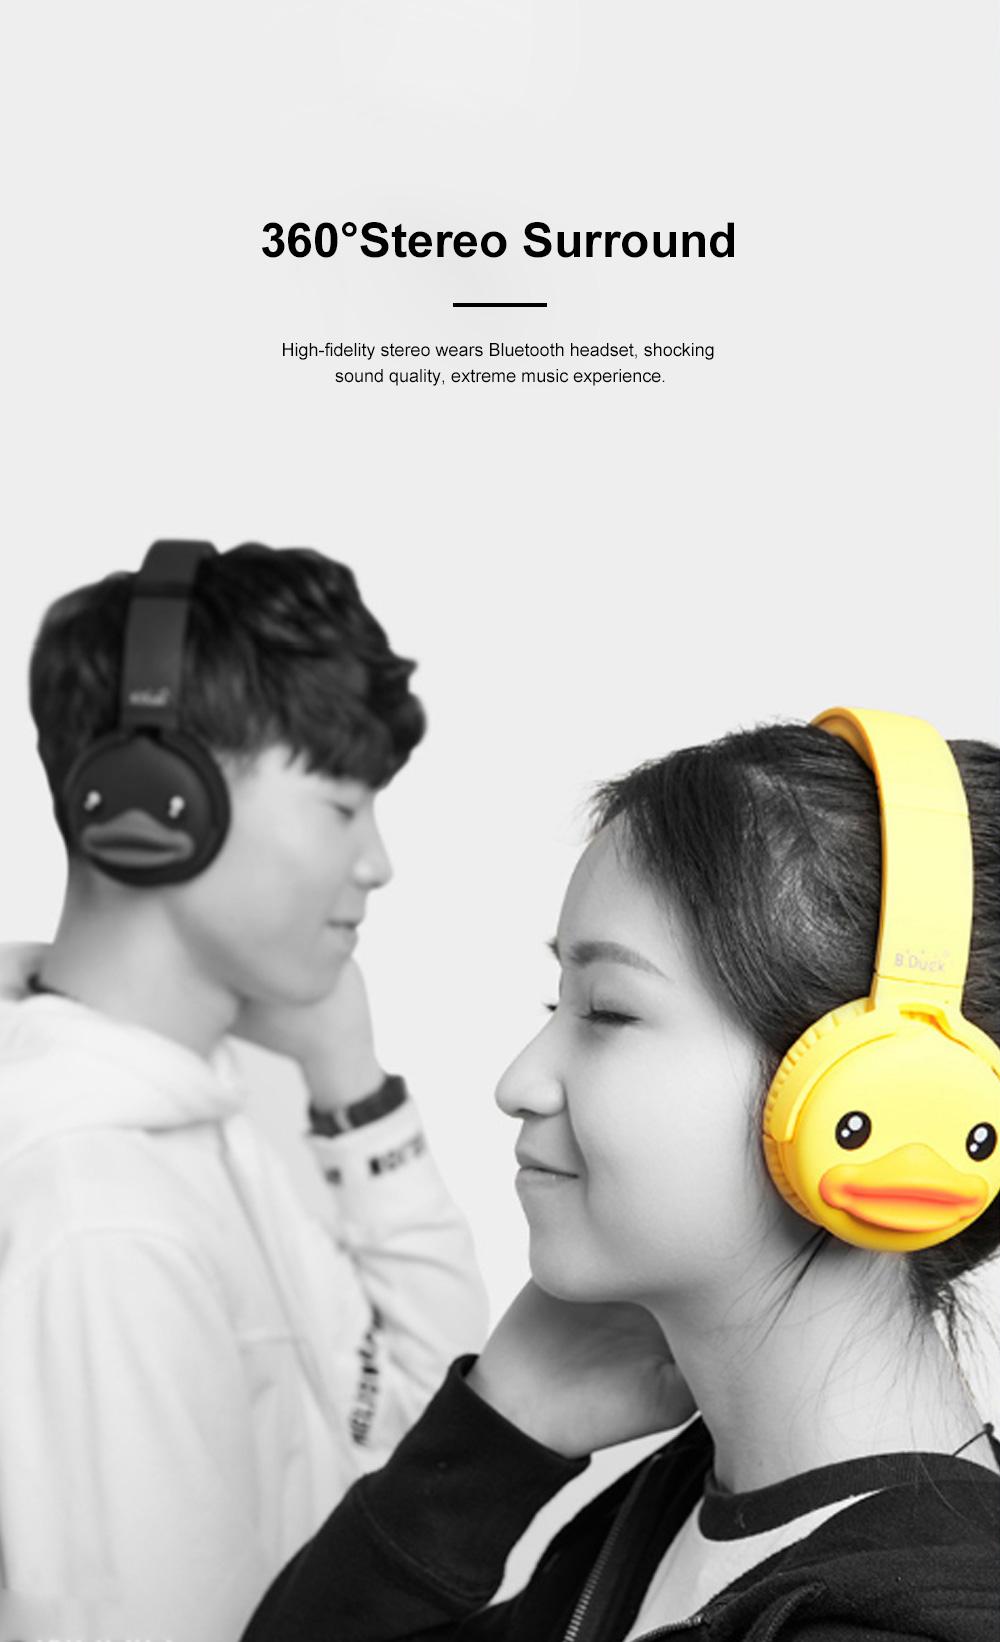 B.Duck Bluetooth Headphones Wireless Headset for Women Men Mobile Noise Reduction Sports Headphones Music Stereo 3